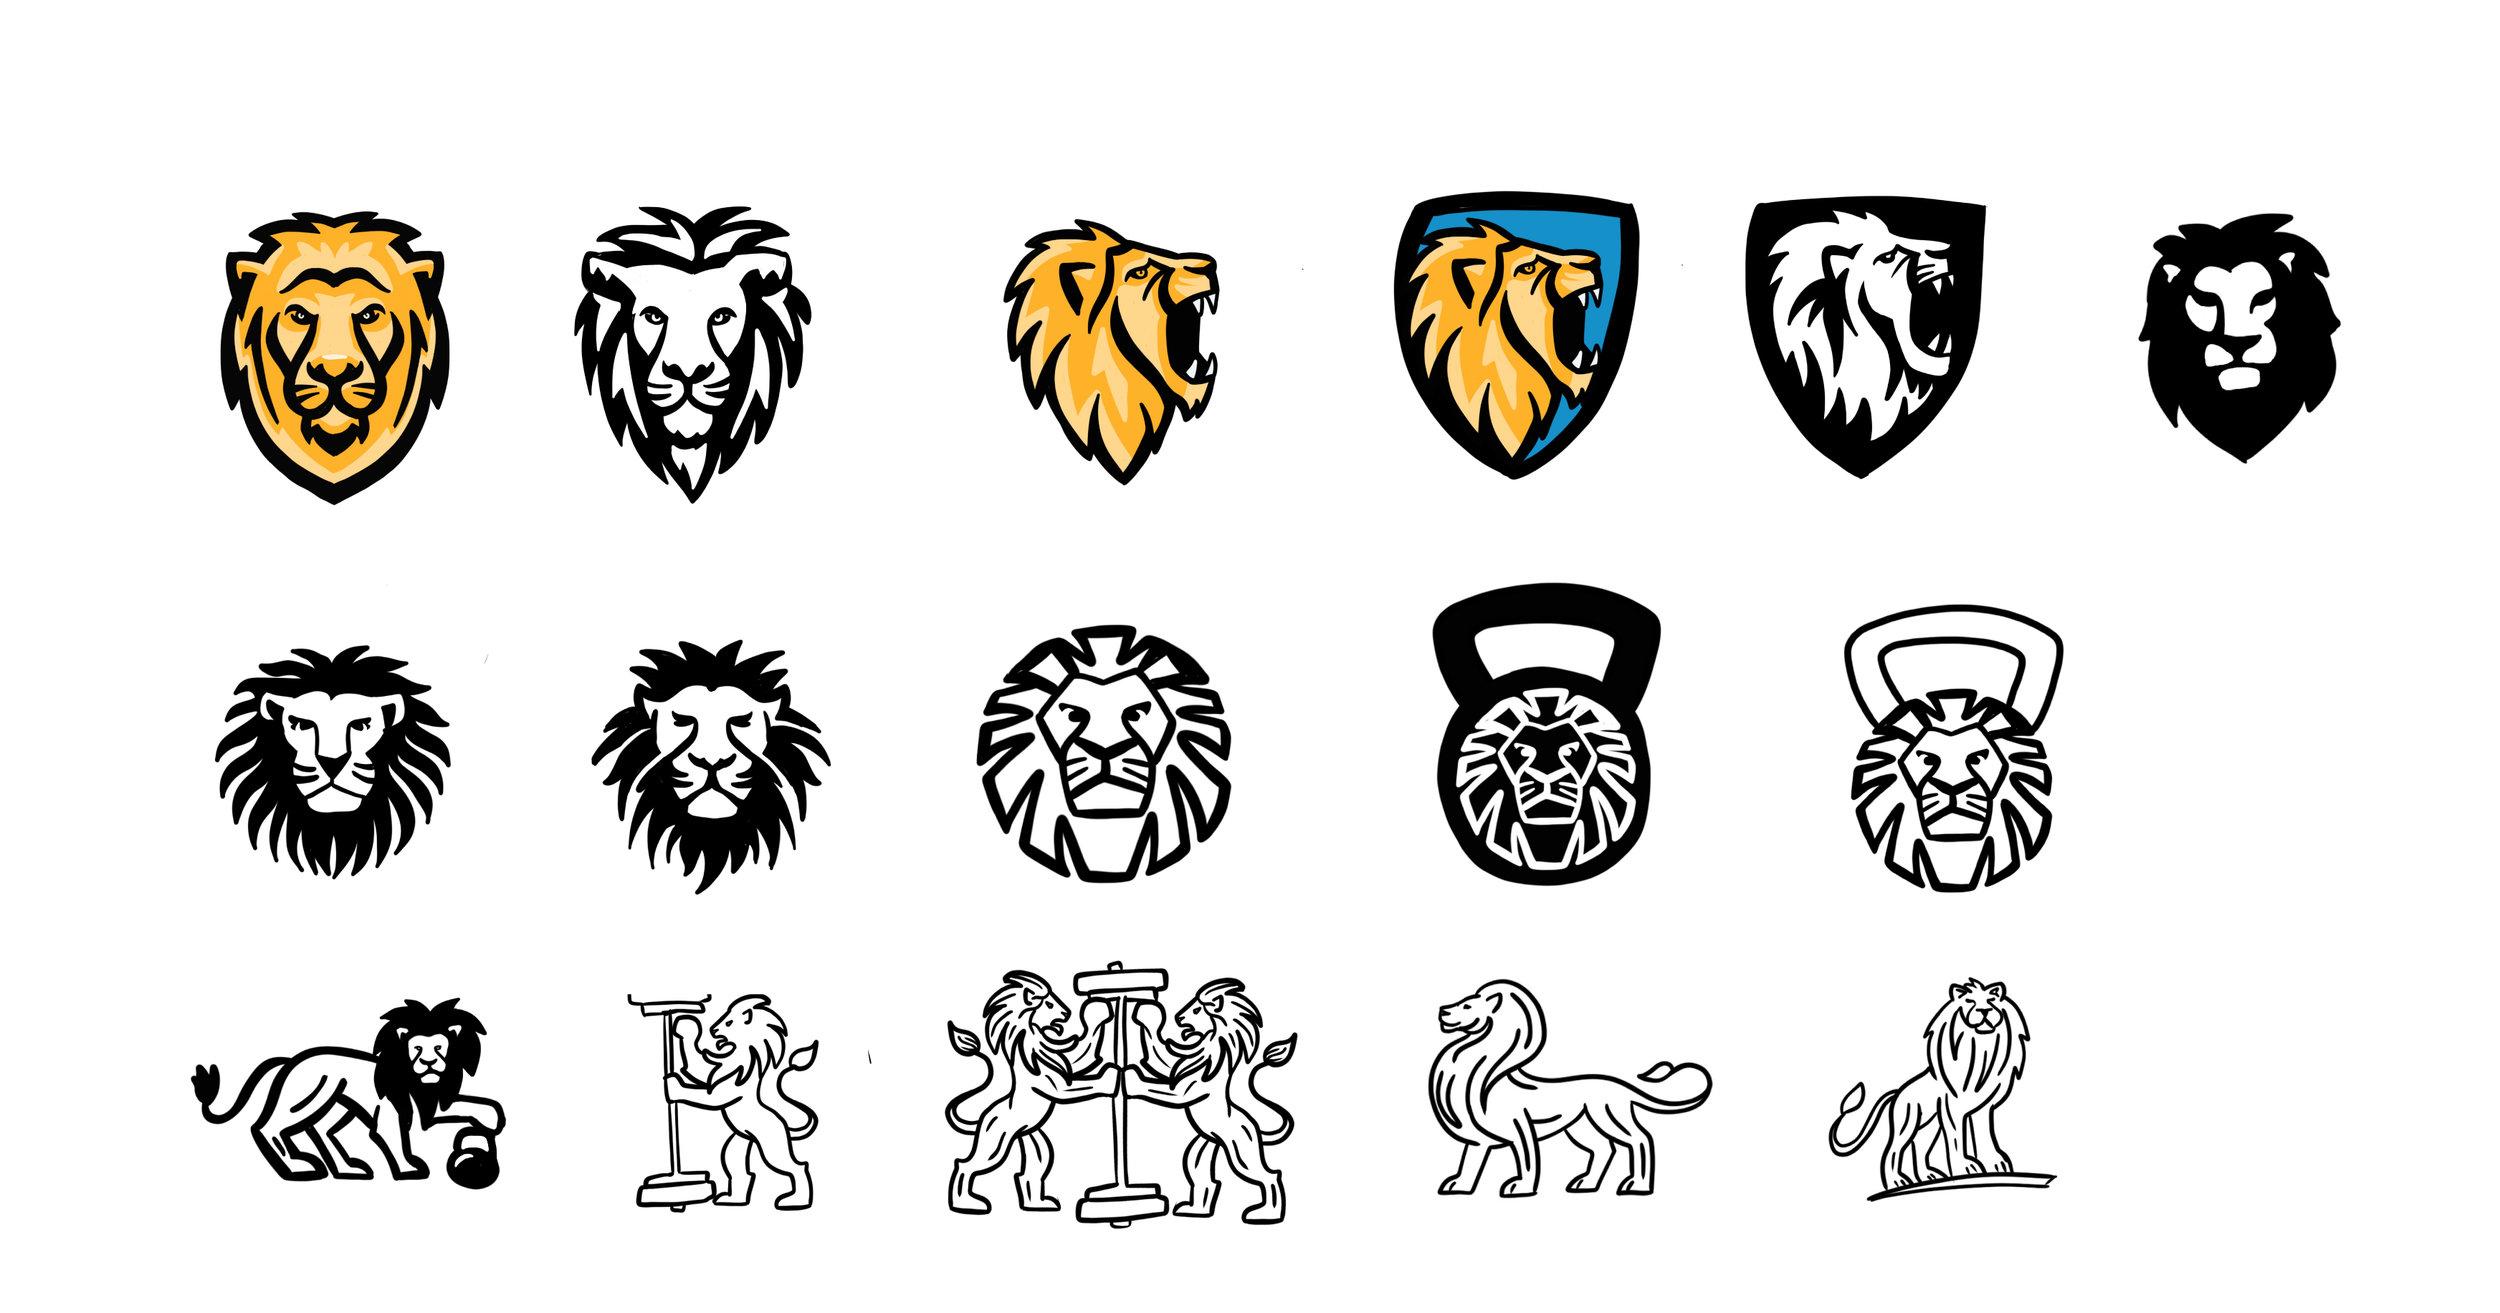 MLFA_lions.jpg